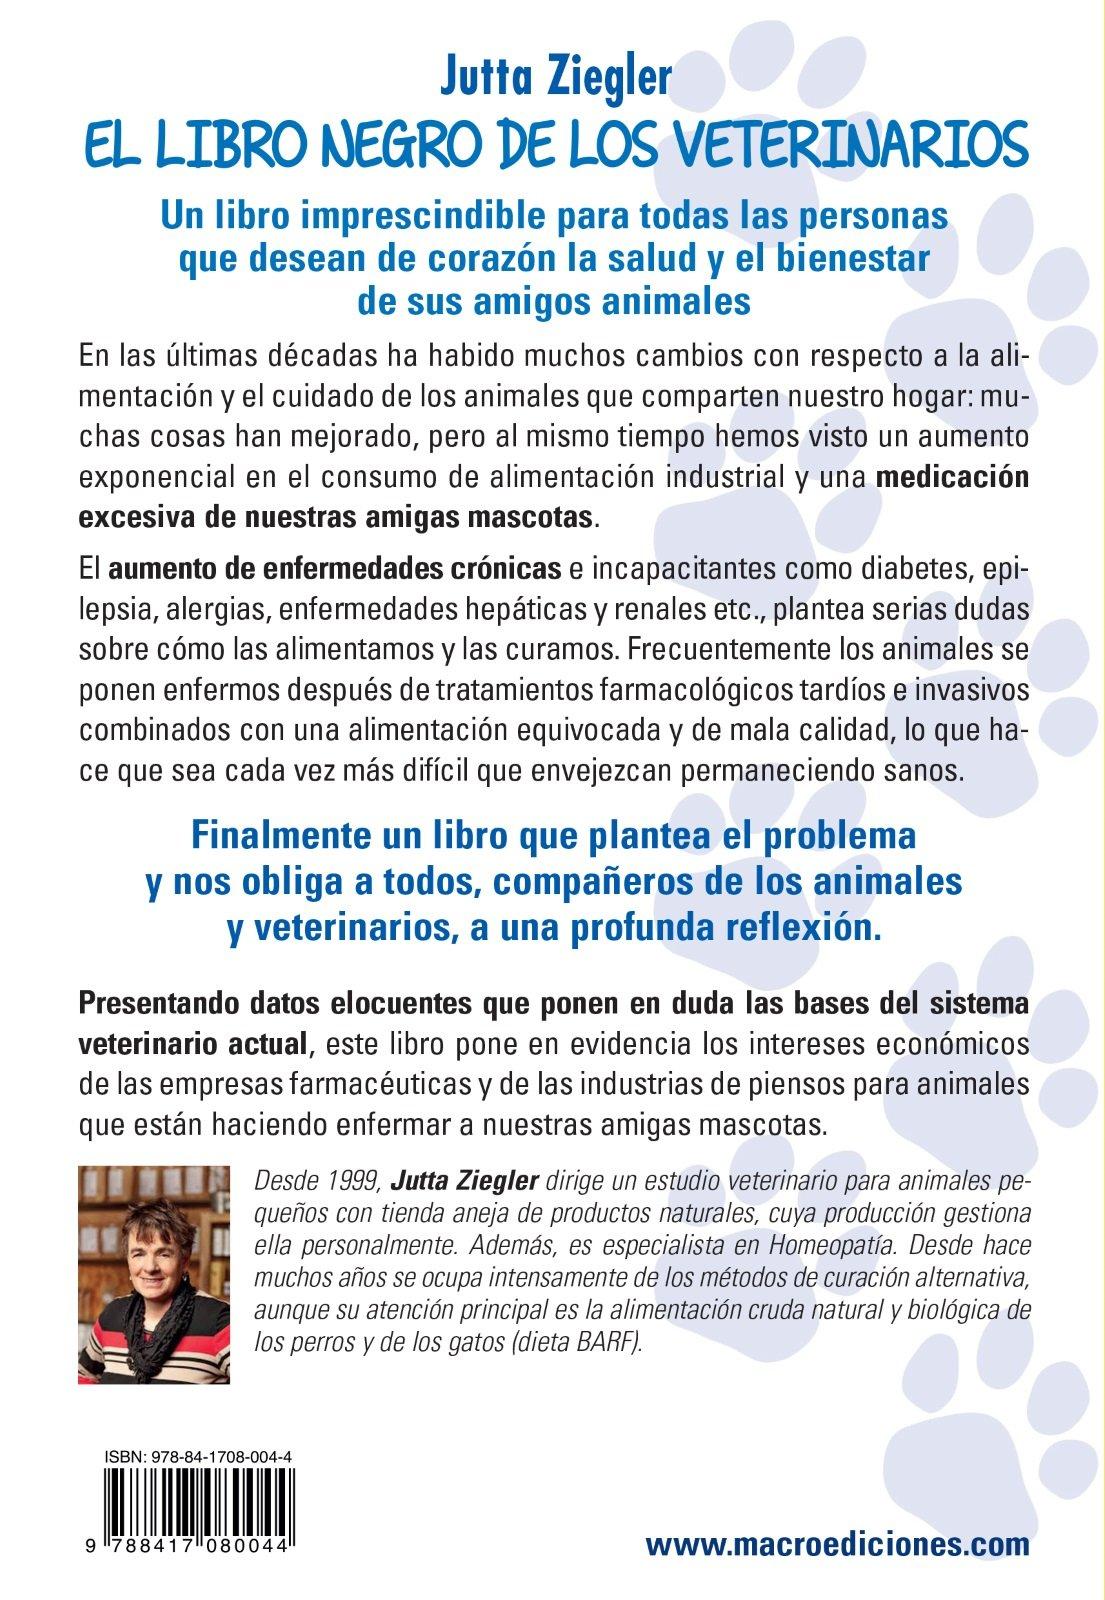 LIBRO NEGRO DEL VETERINARIO, EL: Jutta Ziegler: 9788417080044: Amazon.com: Books